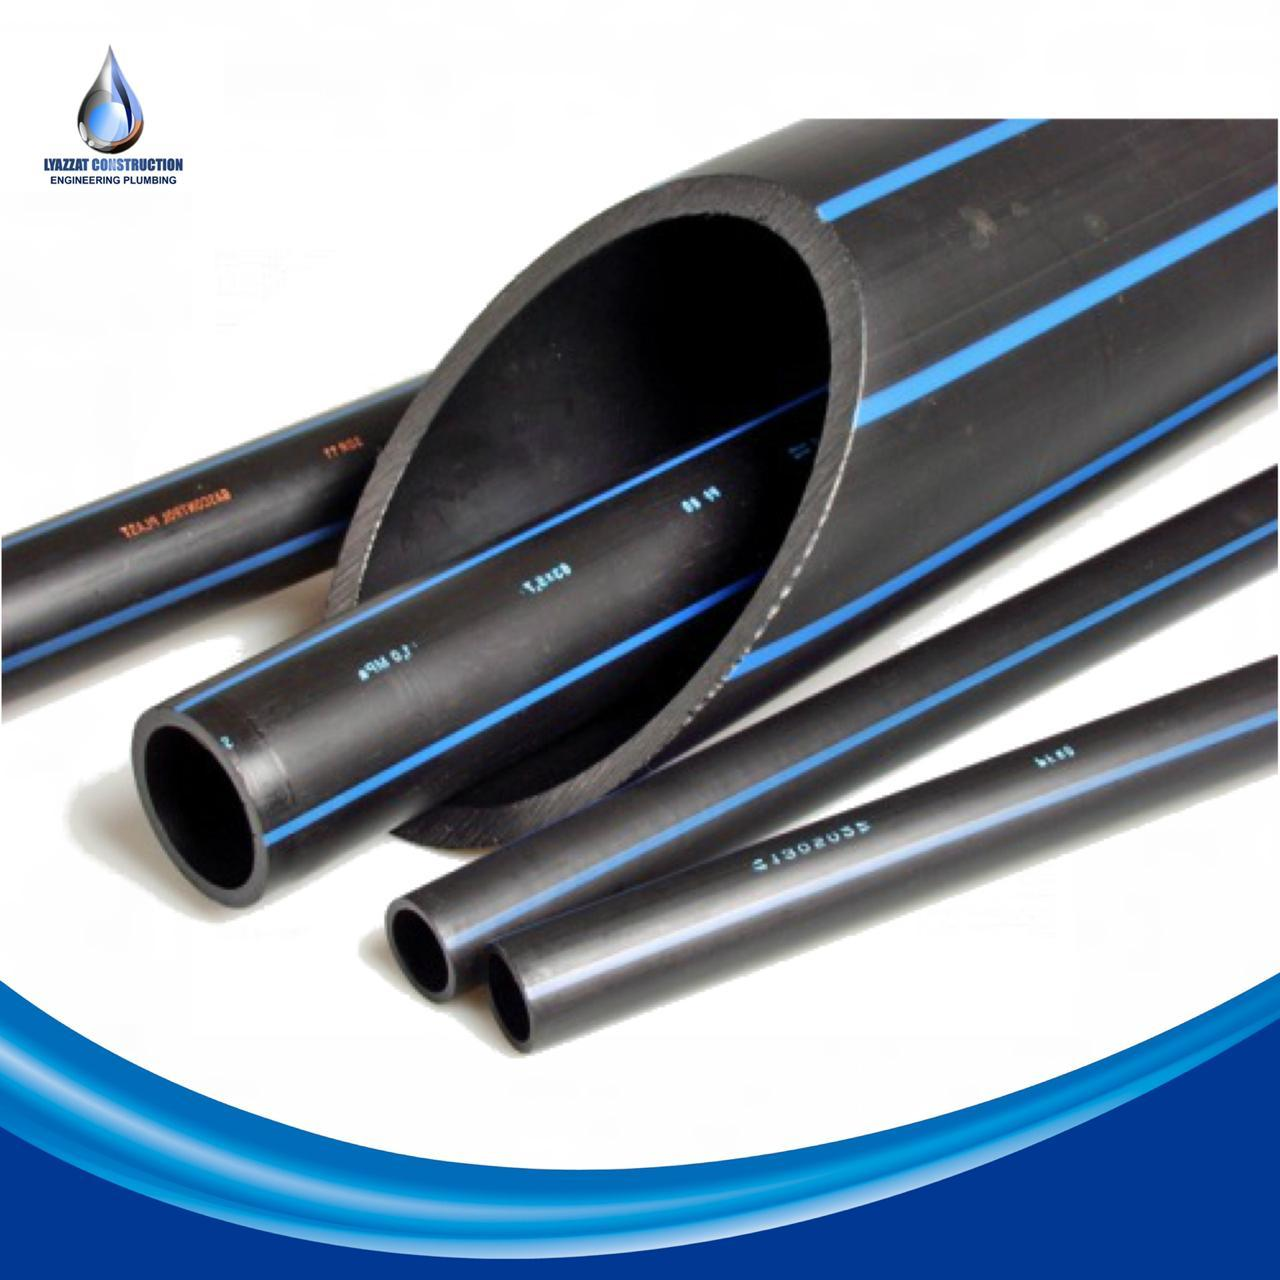 Труба полиэтиленовая ПЭ 100 SDR 13.6 DN 90х6.7